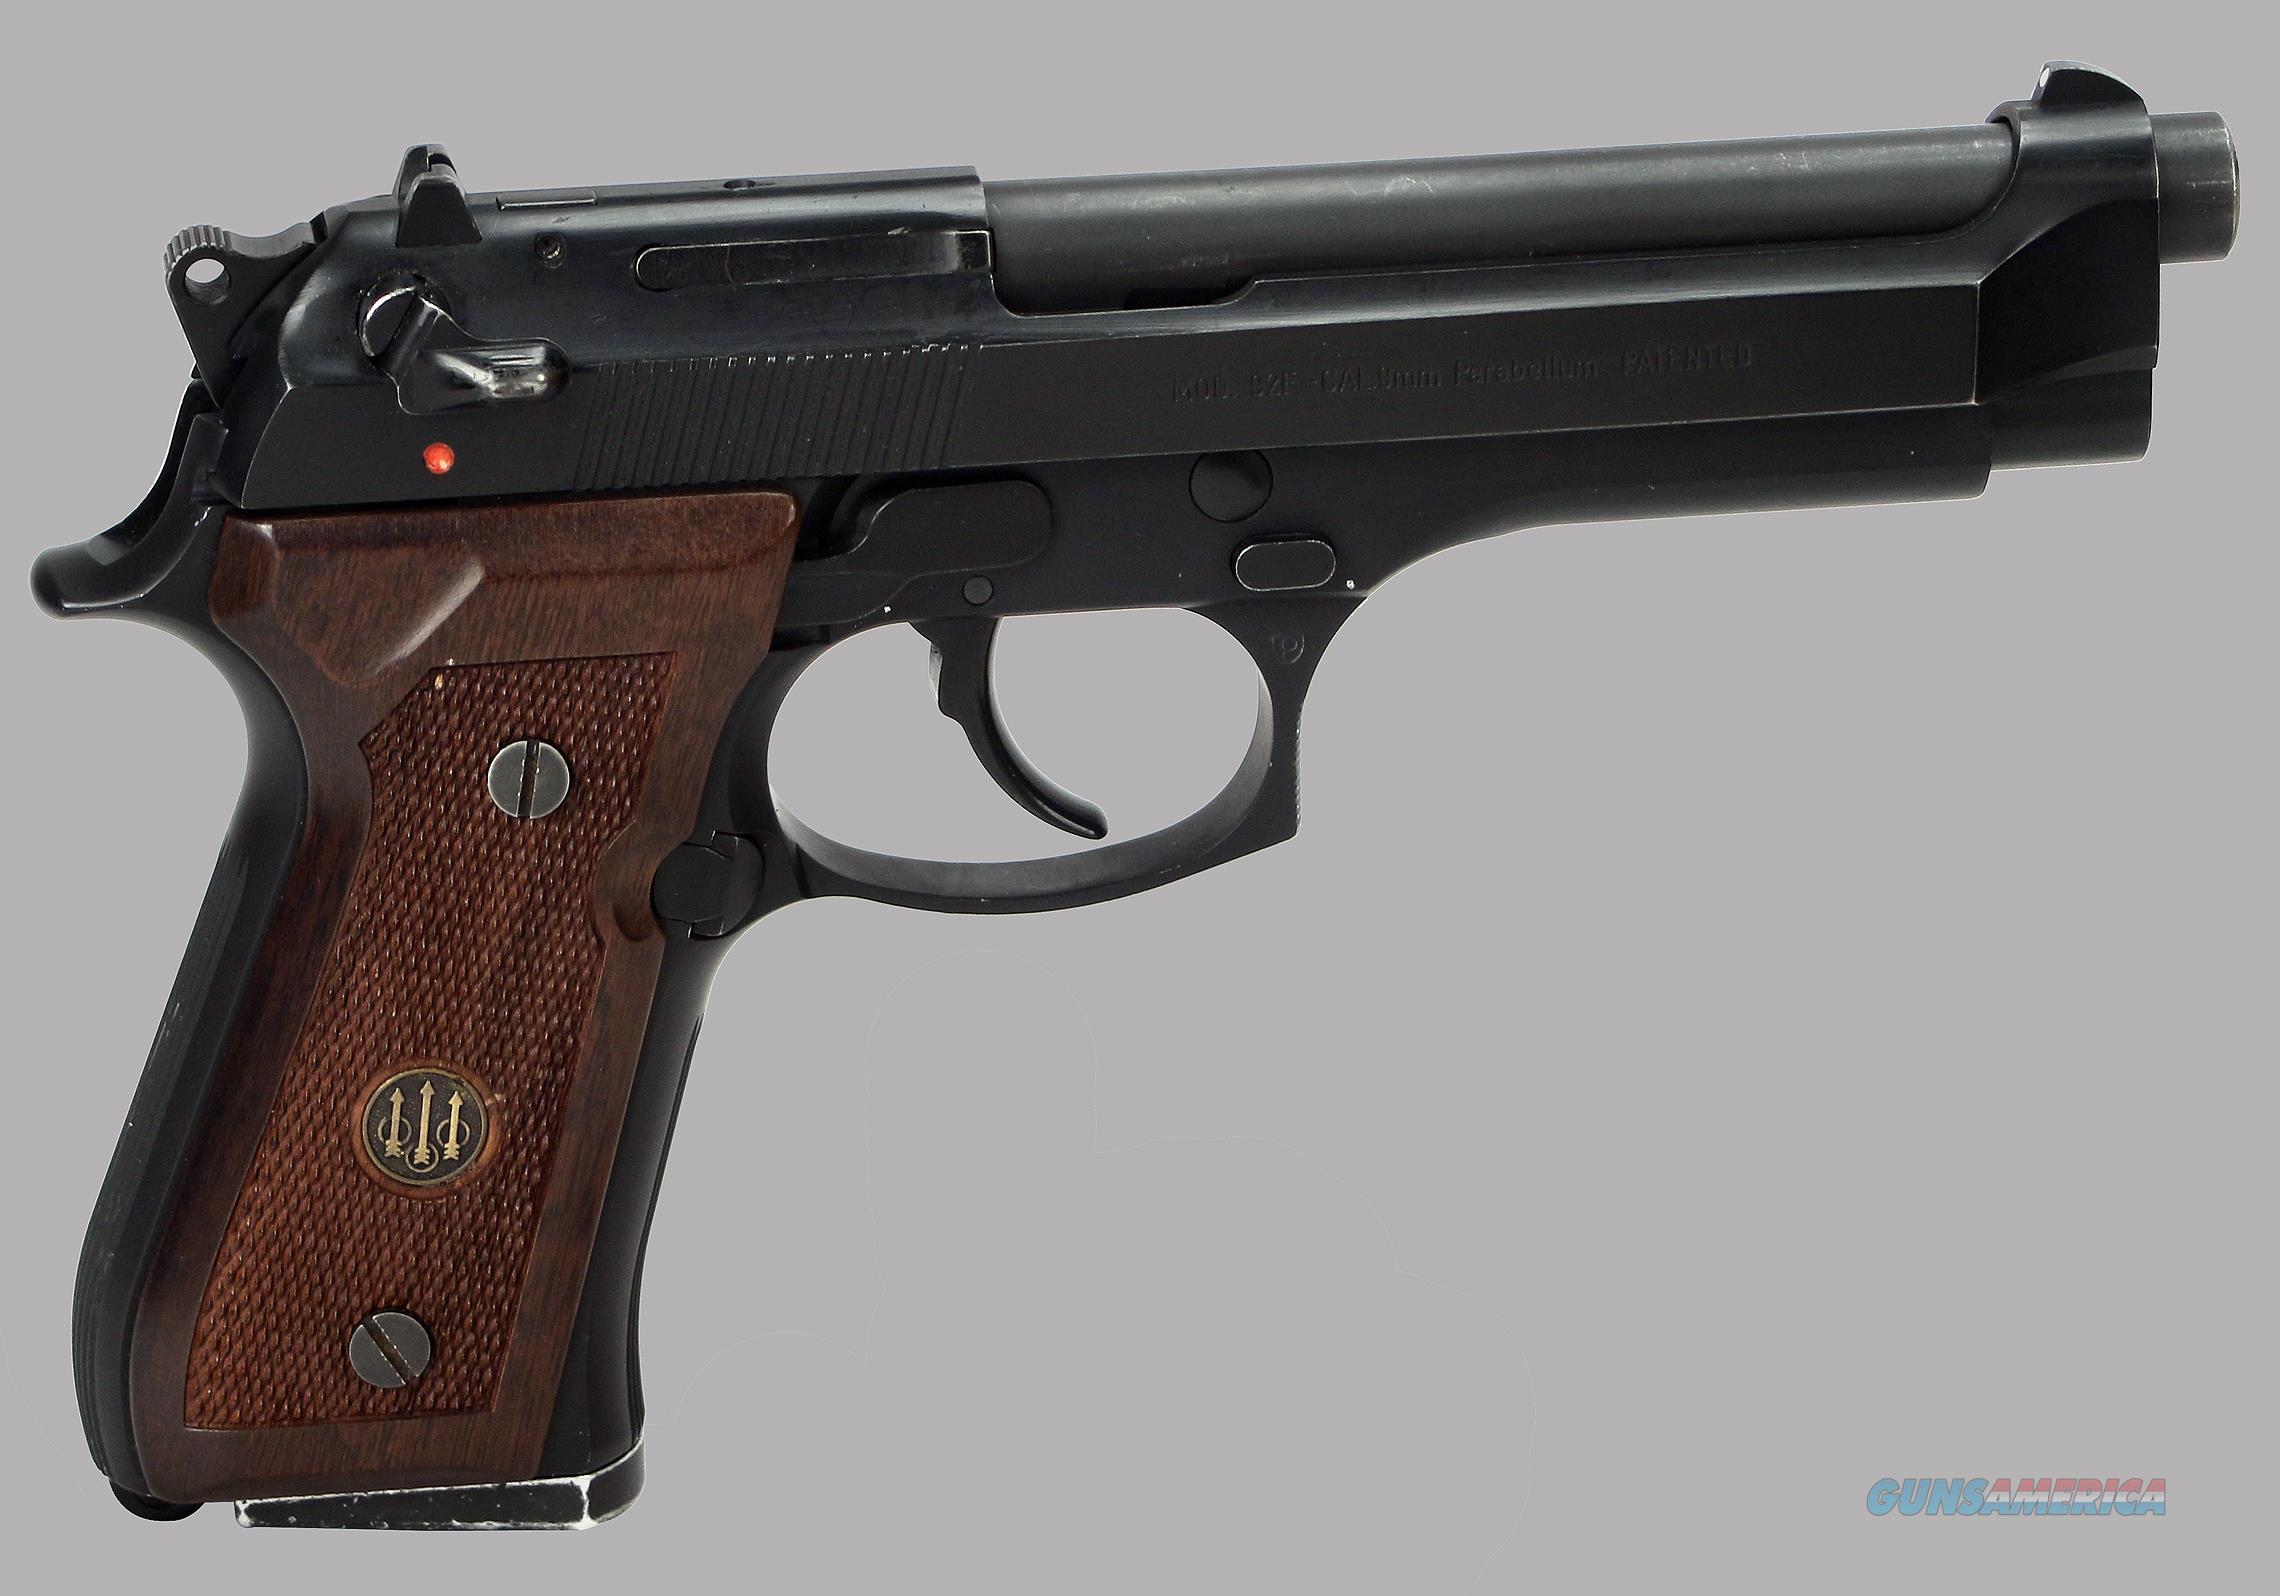 Beretta 92F 9mm Pistol for sale